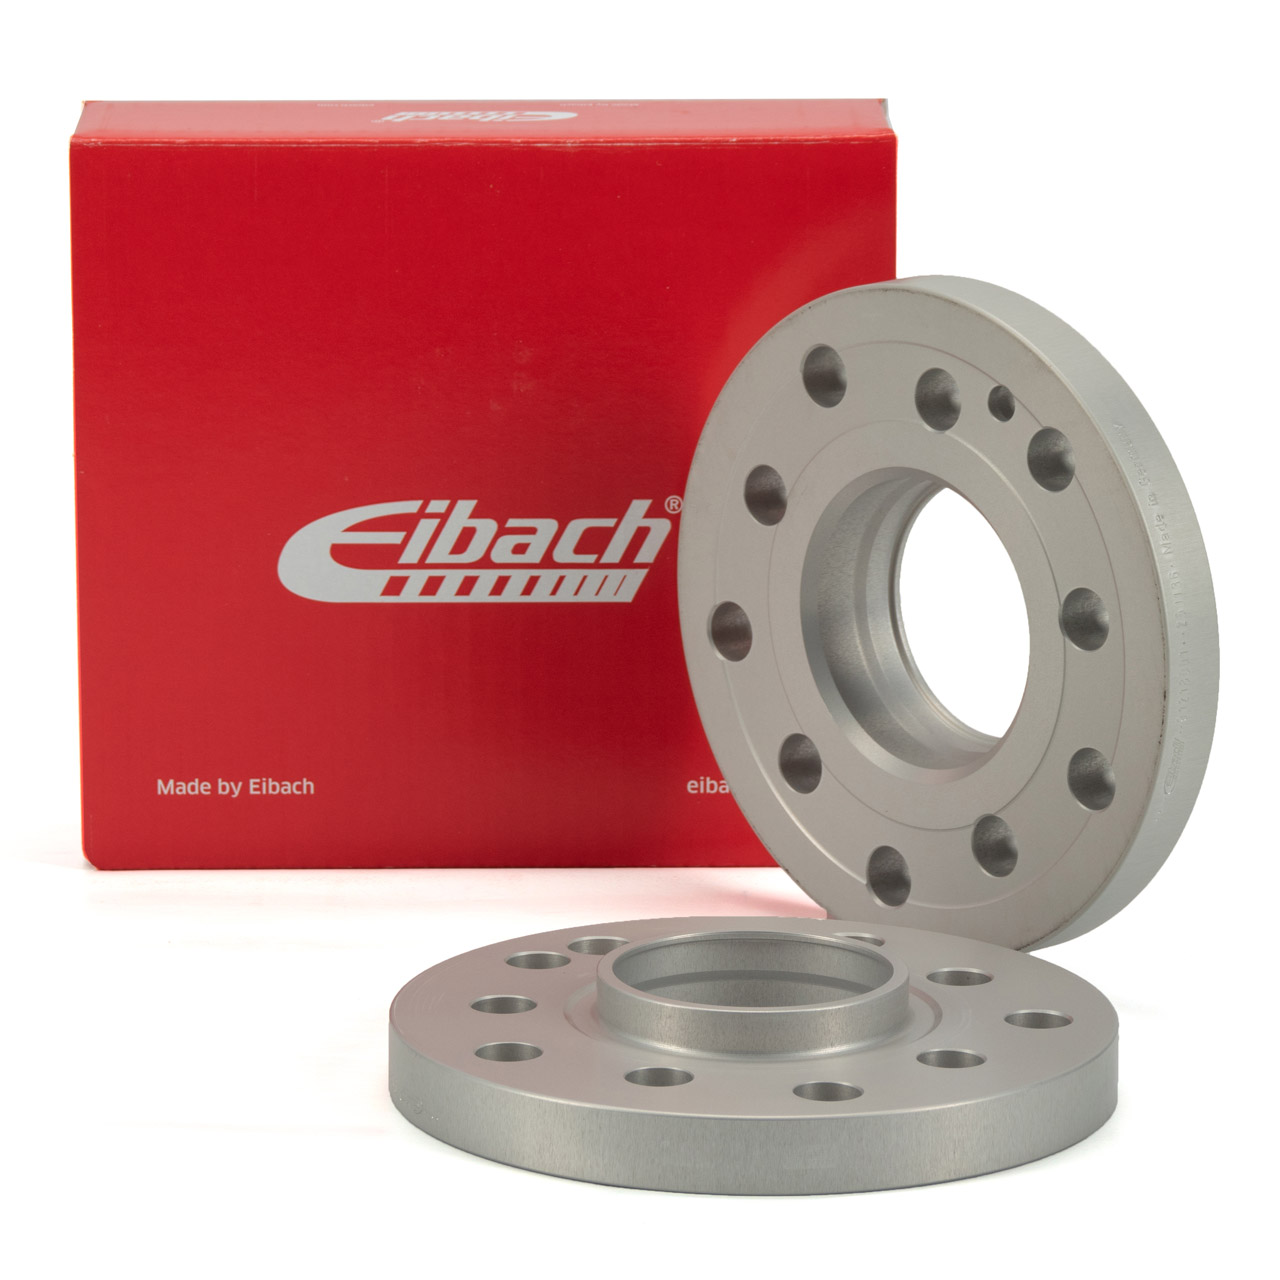 EIBACH PRO SPACER 36mm Spurverbreiterung AUDI Q7 PORSCHE 996 997 991 VW Touareg